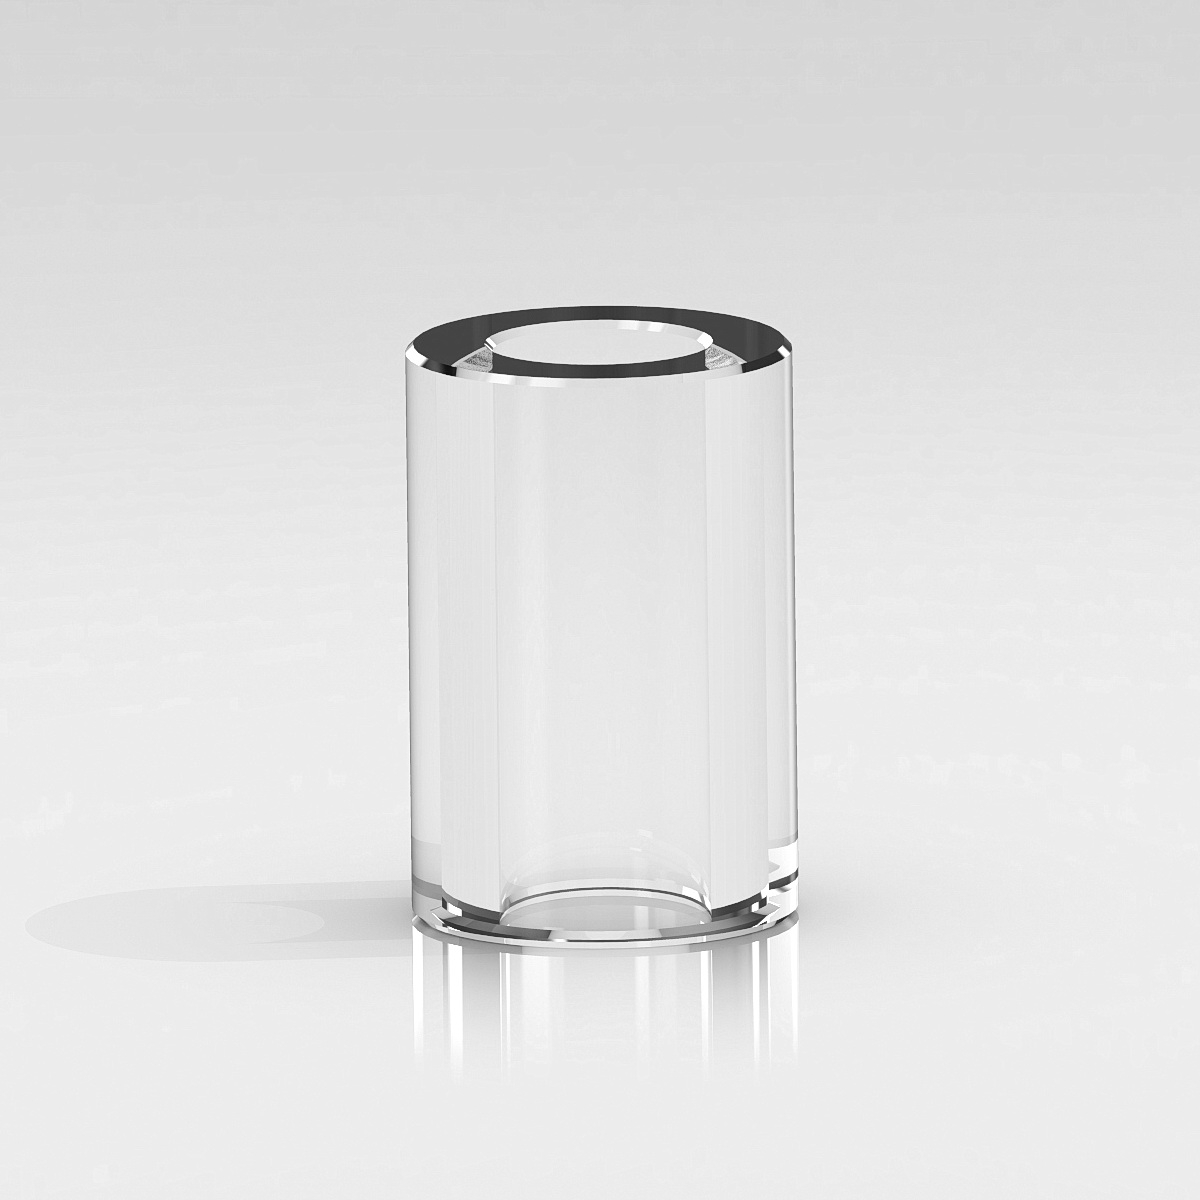 Clear Plastic Tubing, 3/8'' OD x 1/4'' ID x 3/8'' Length. (For 1/4-20 Stud)